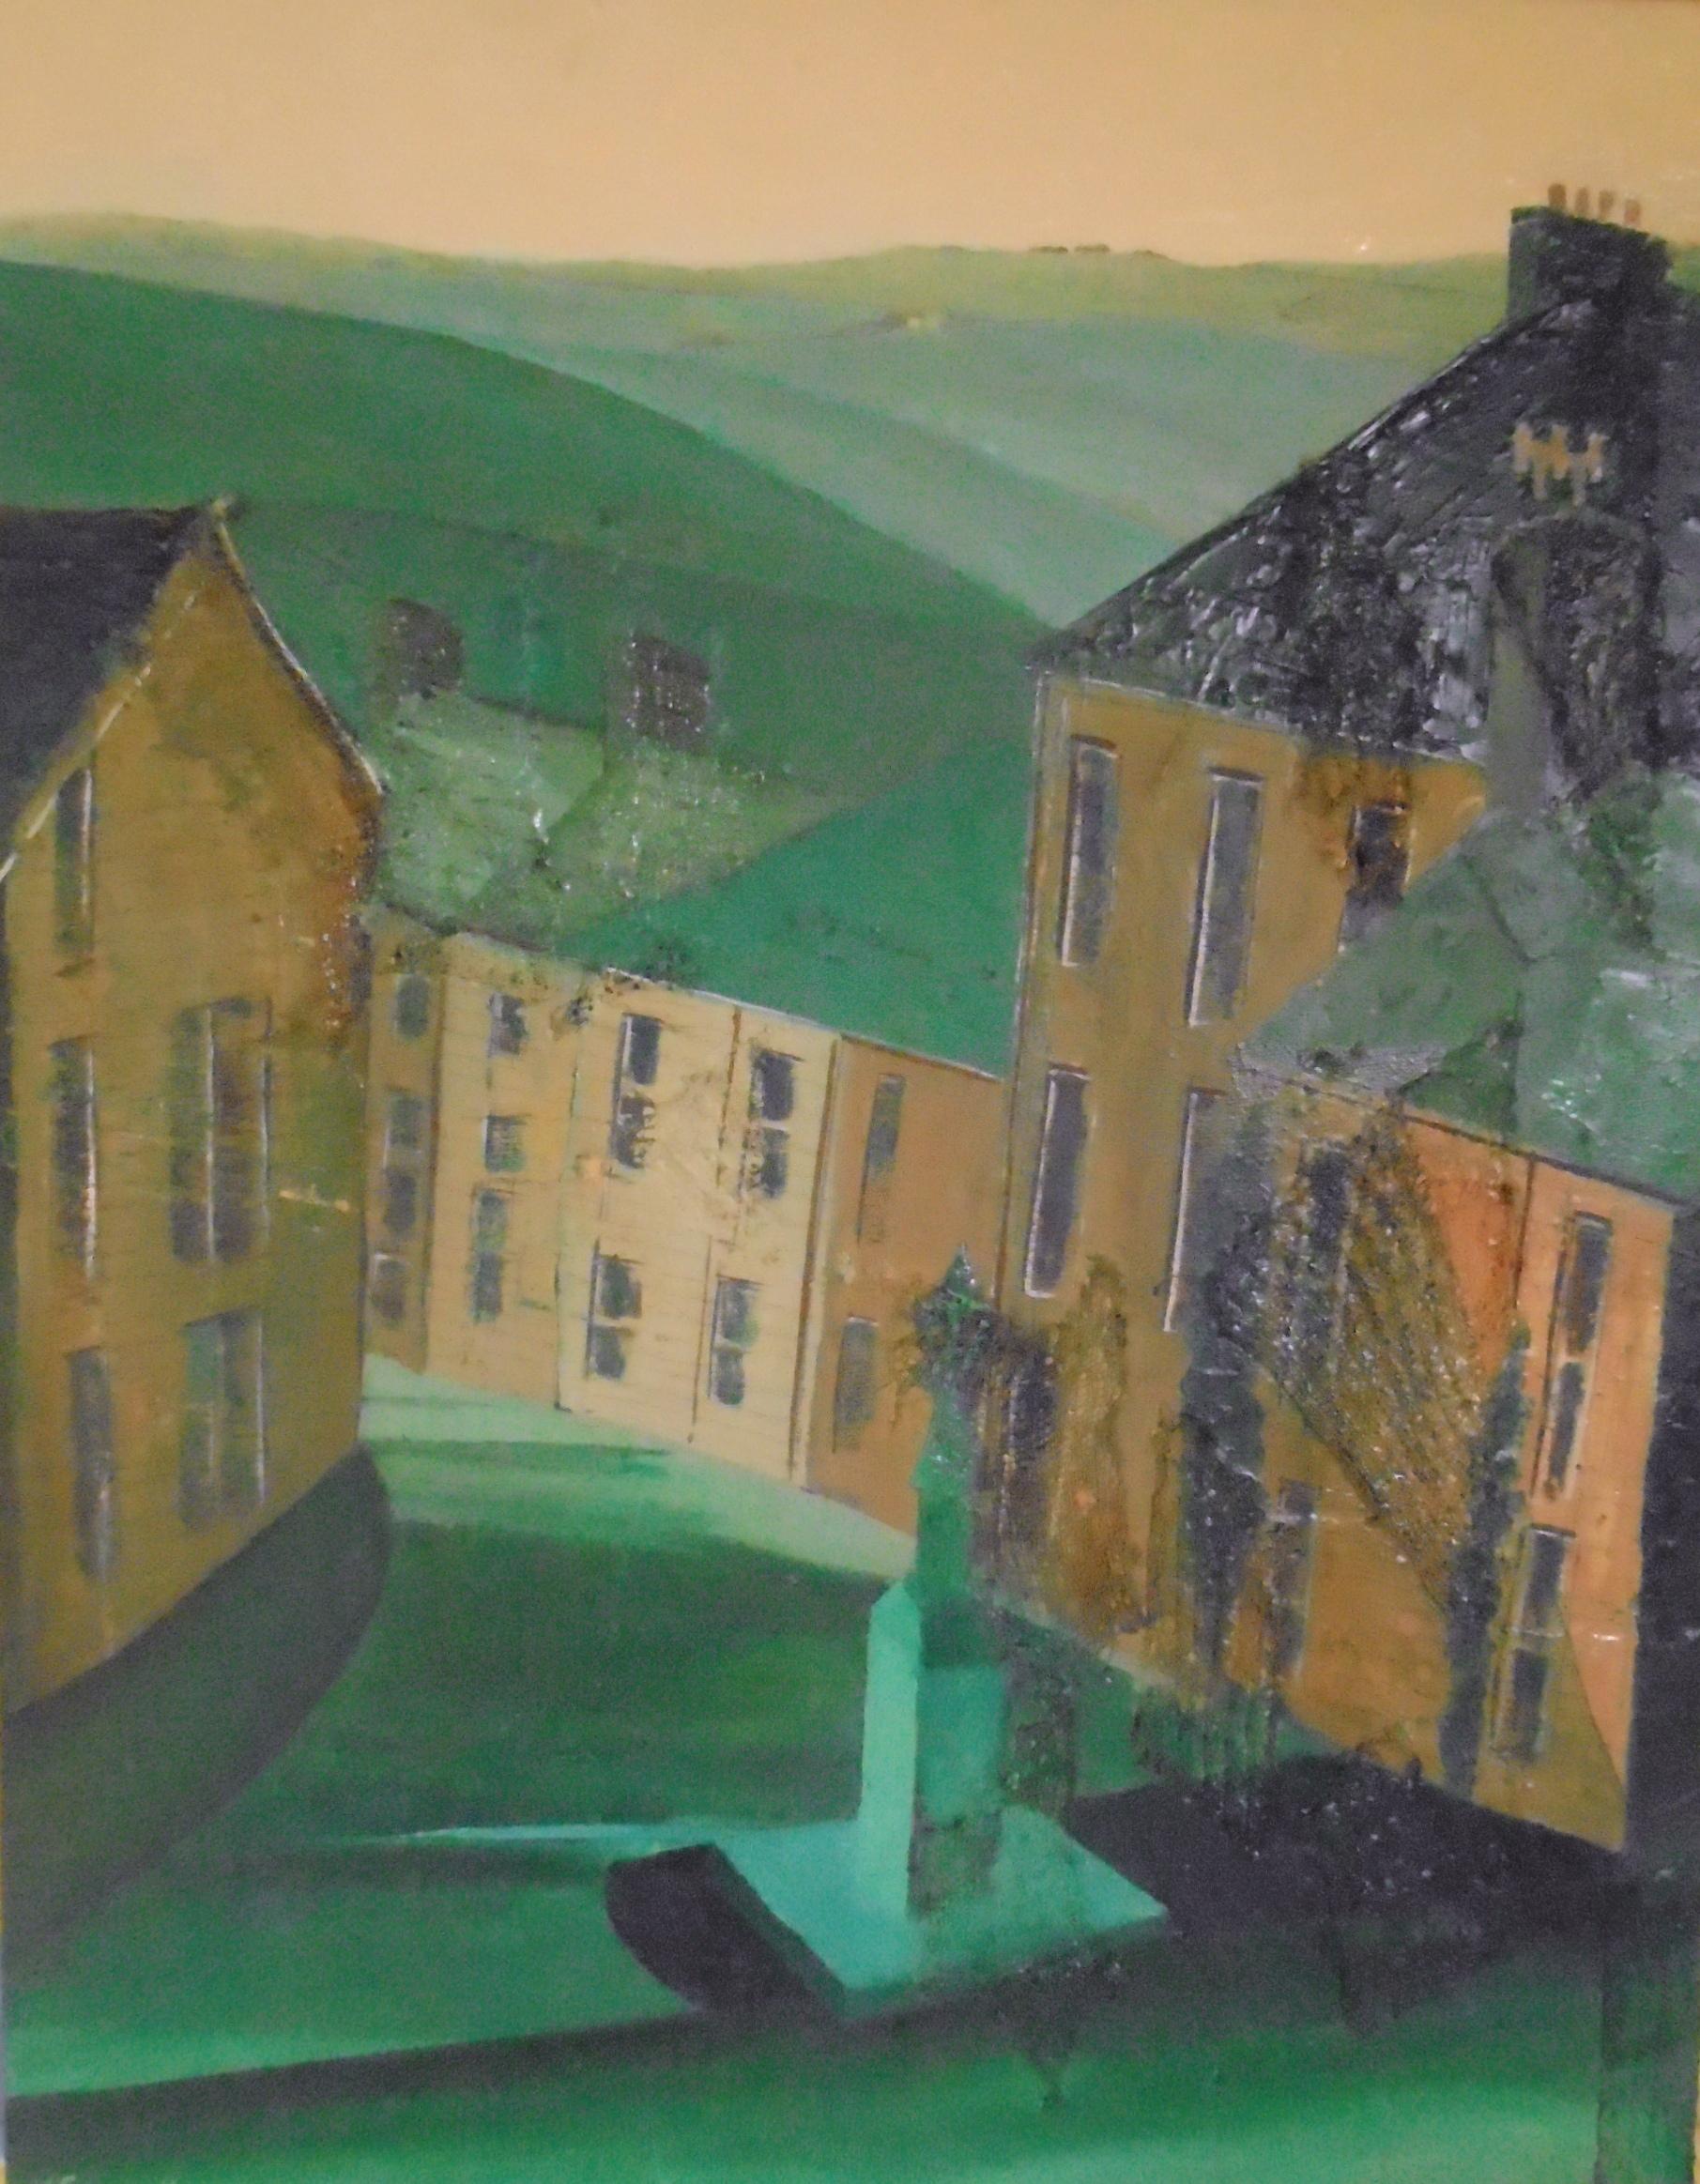 Dobcross village